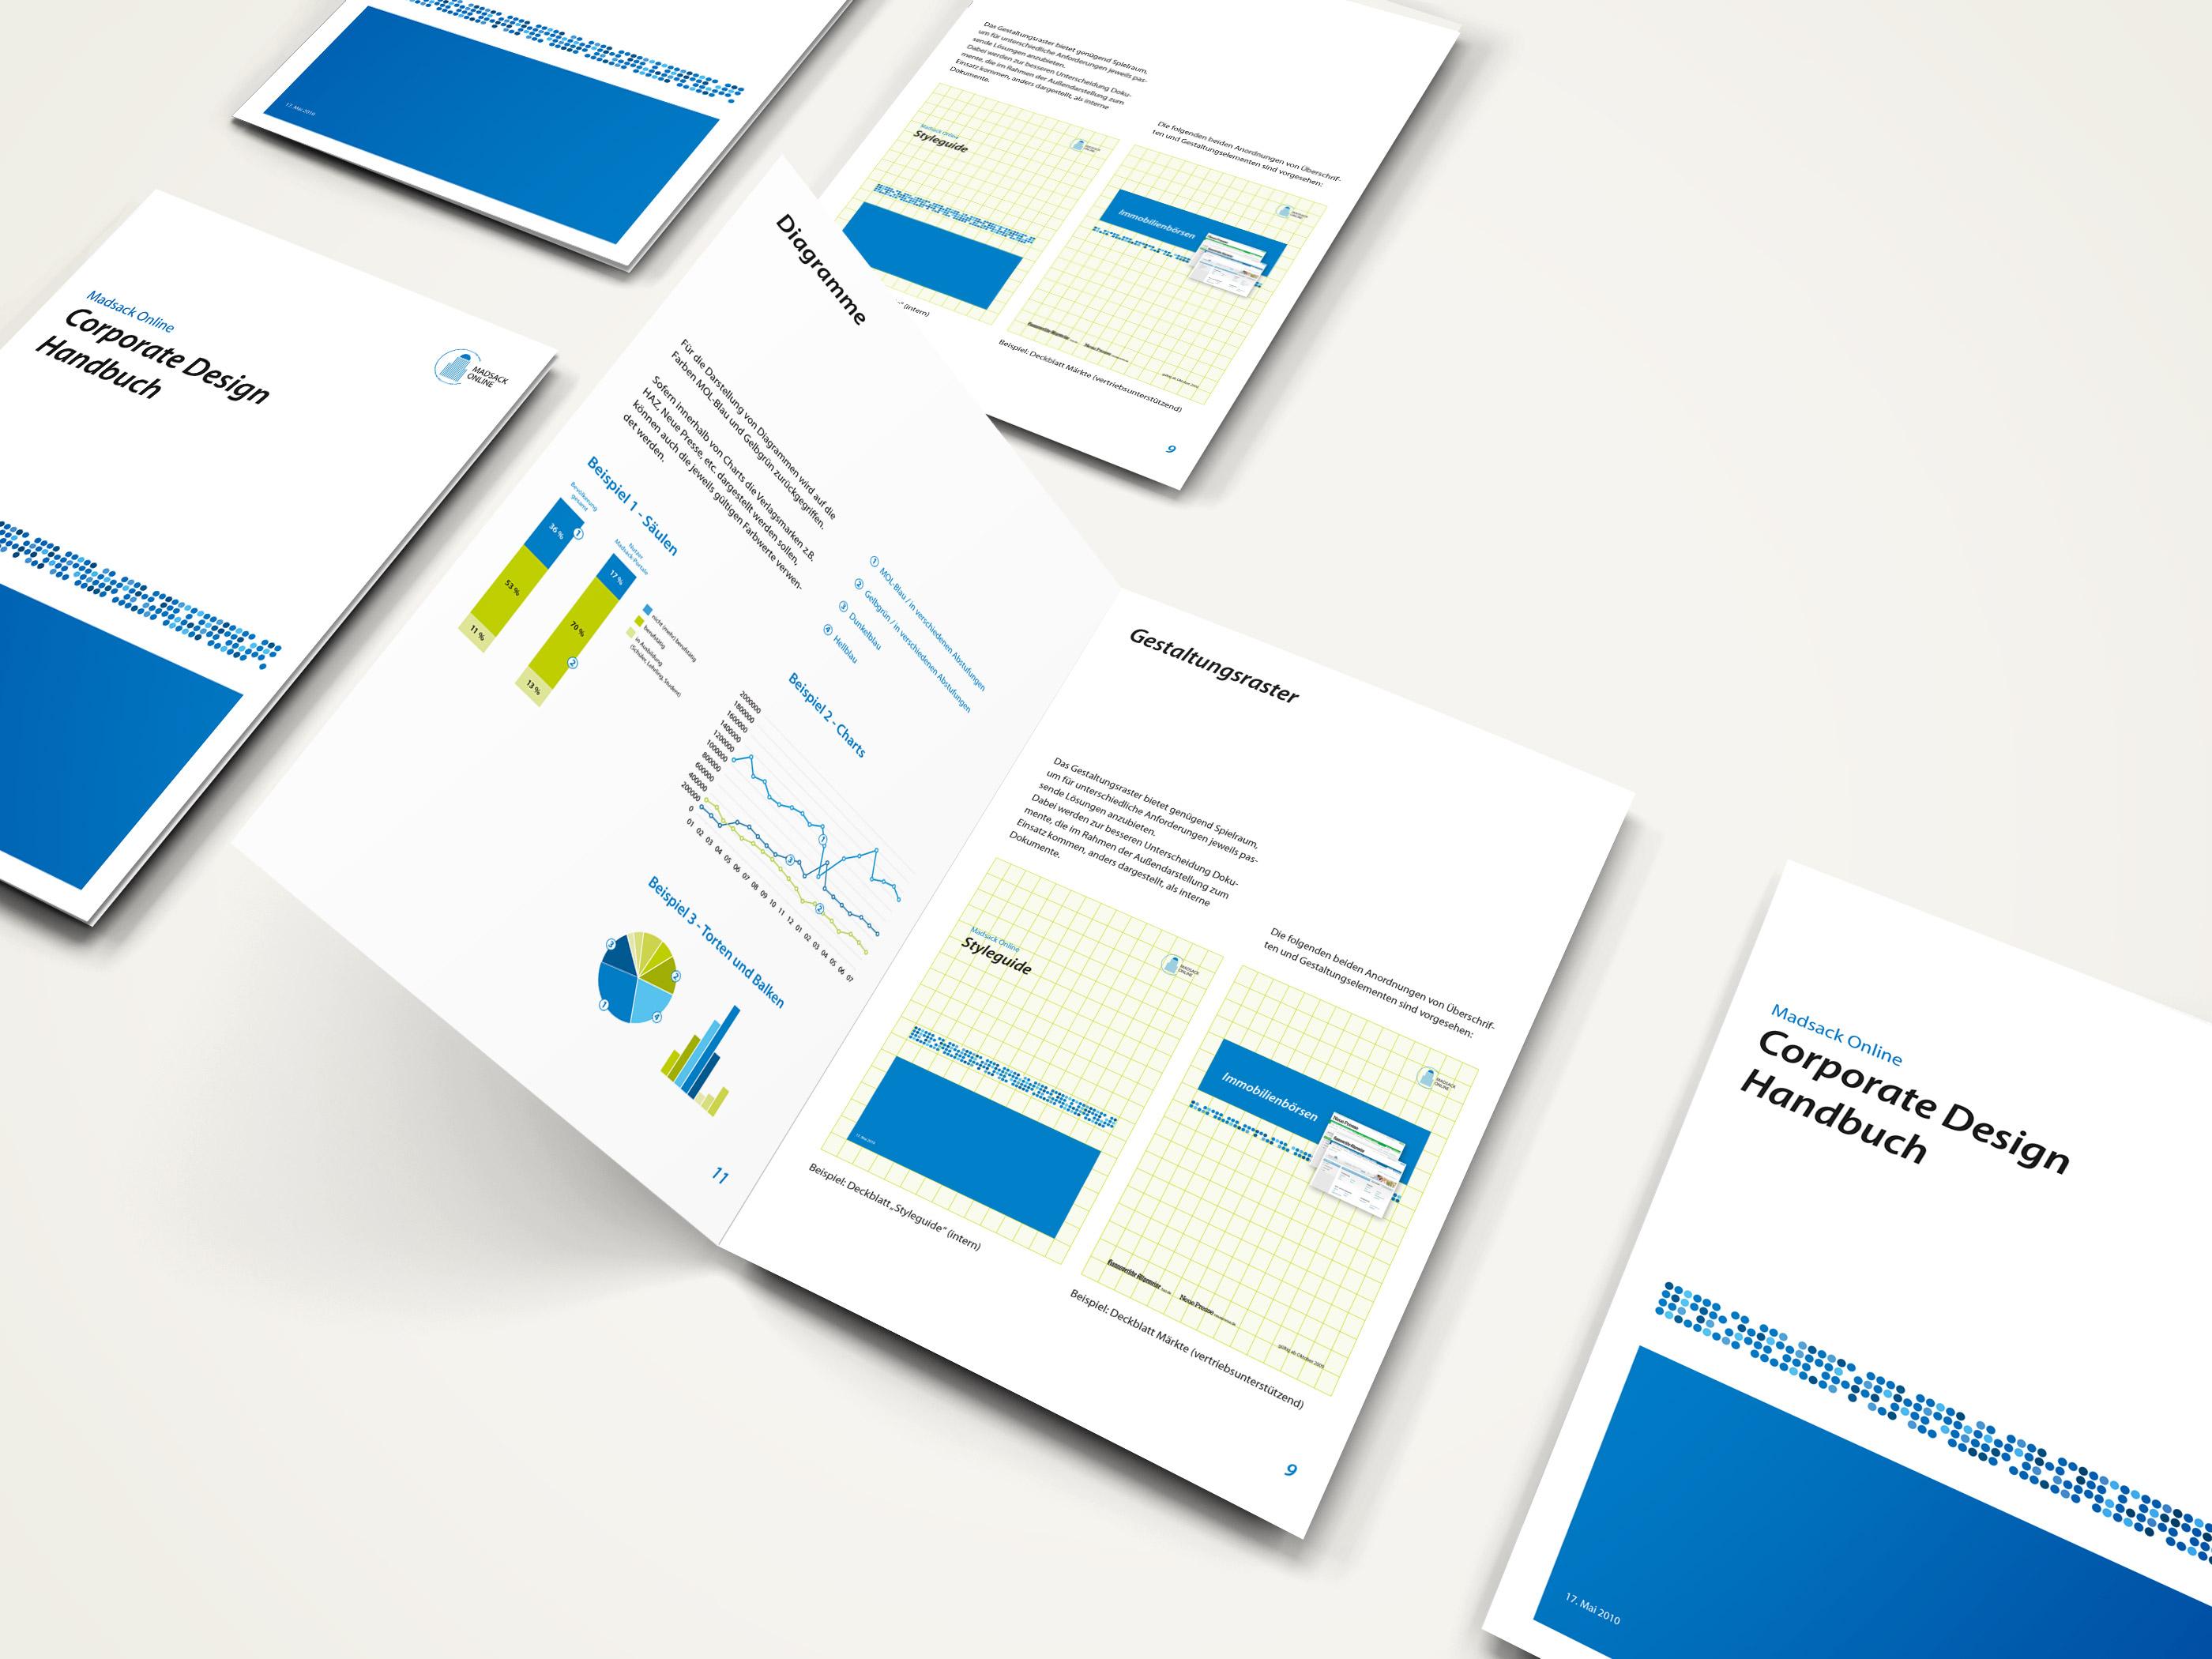 Madsack Online CD-Manual